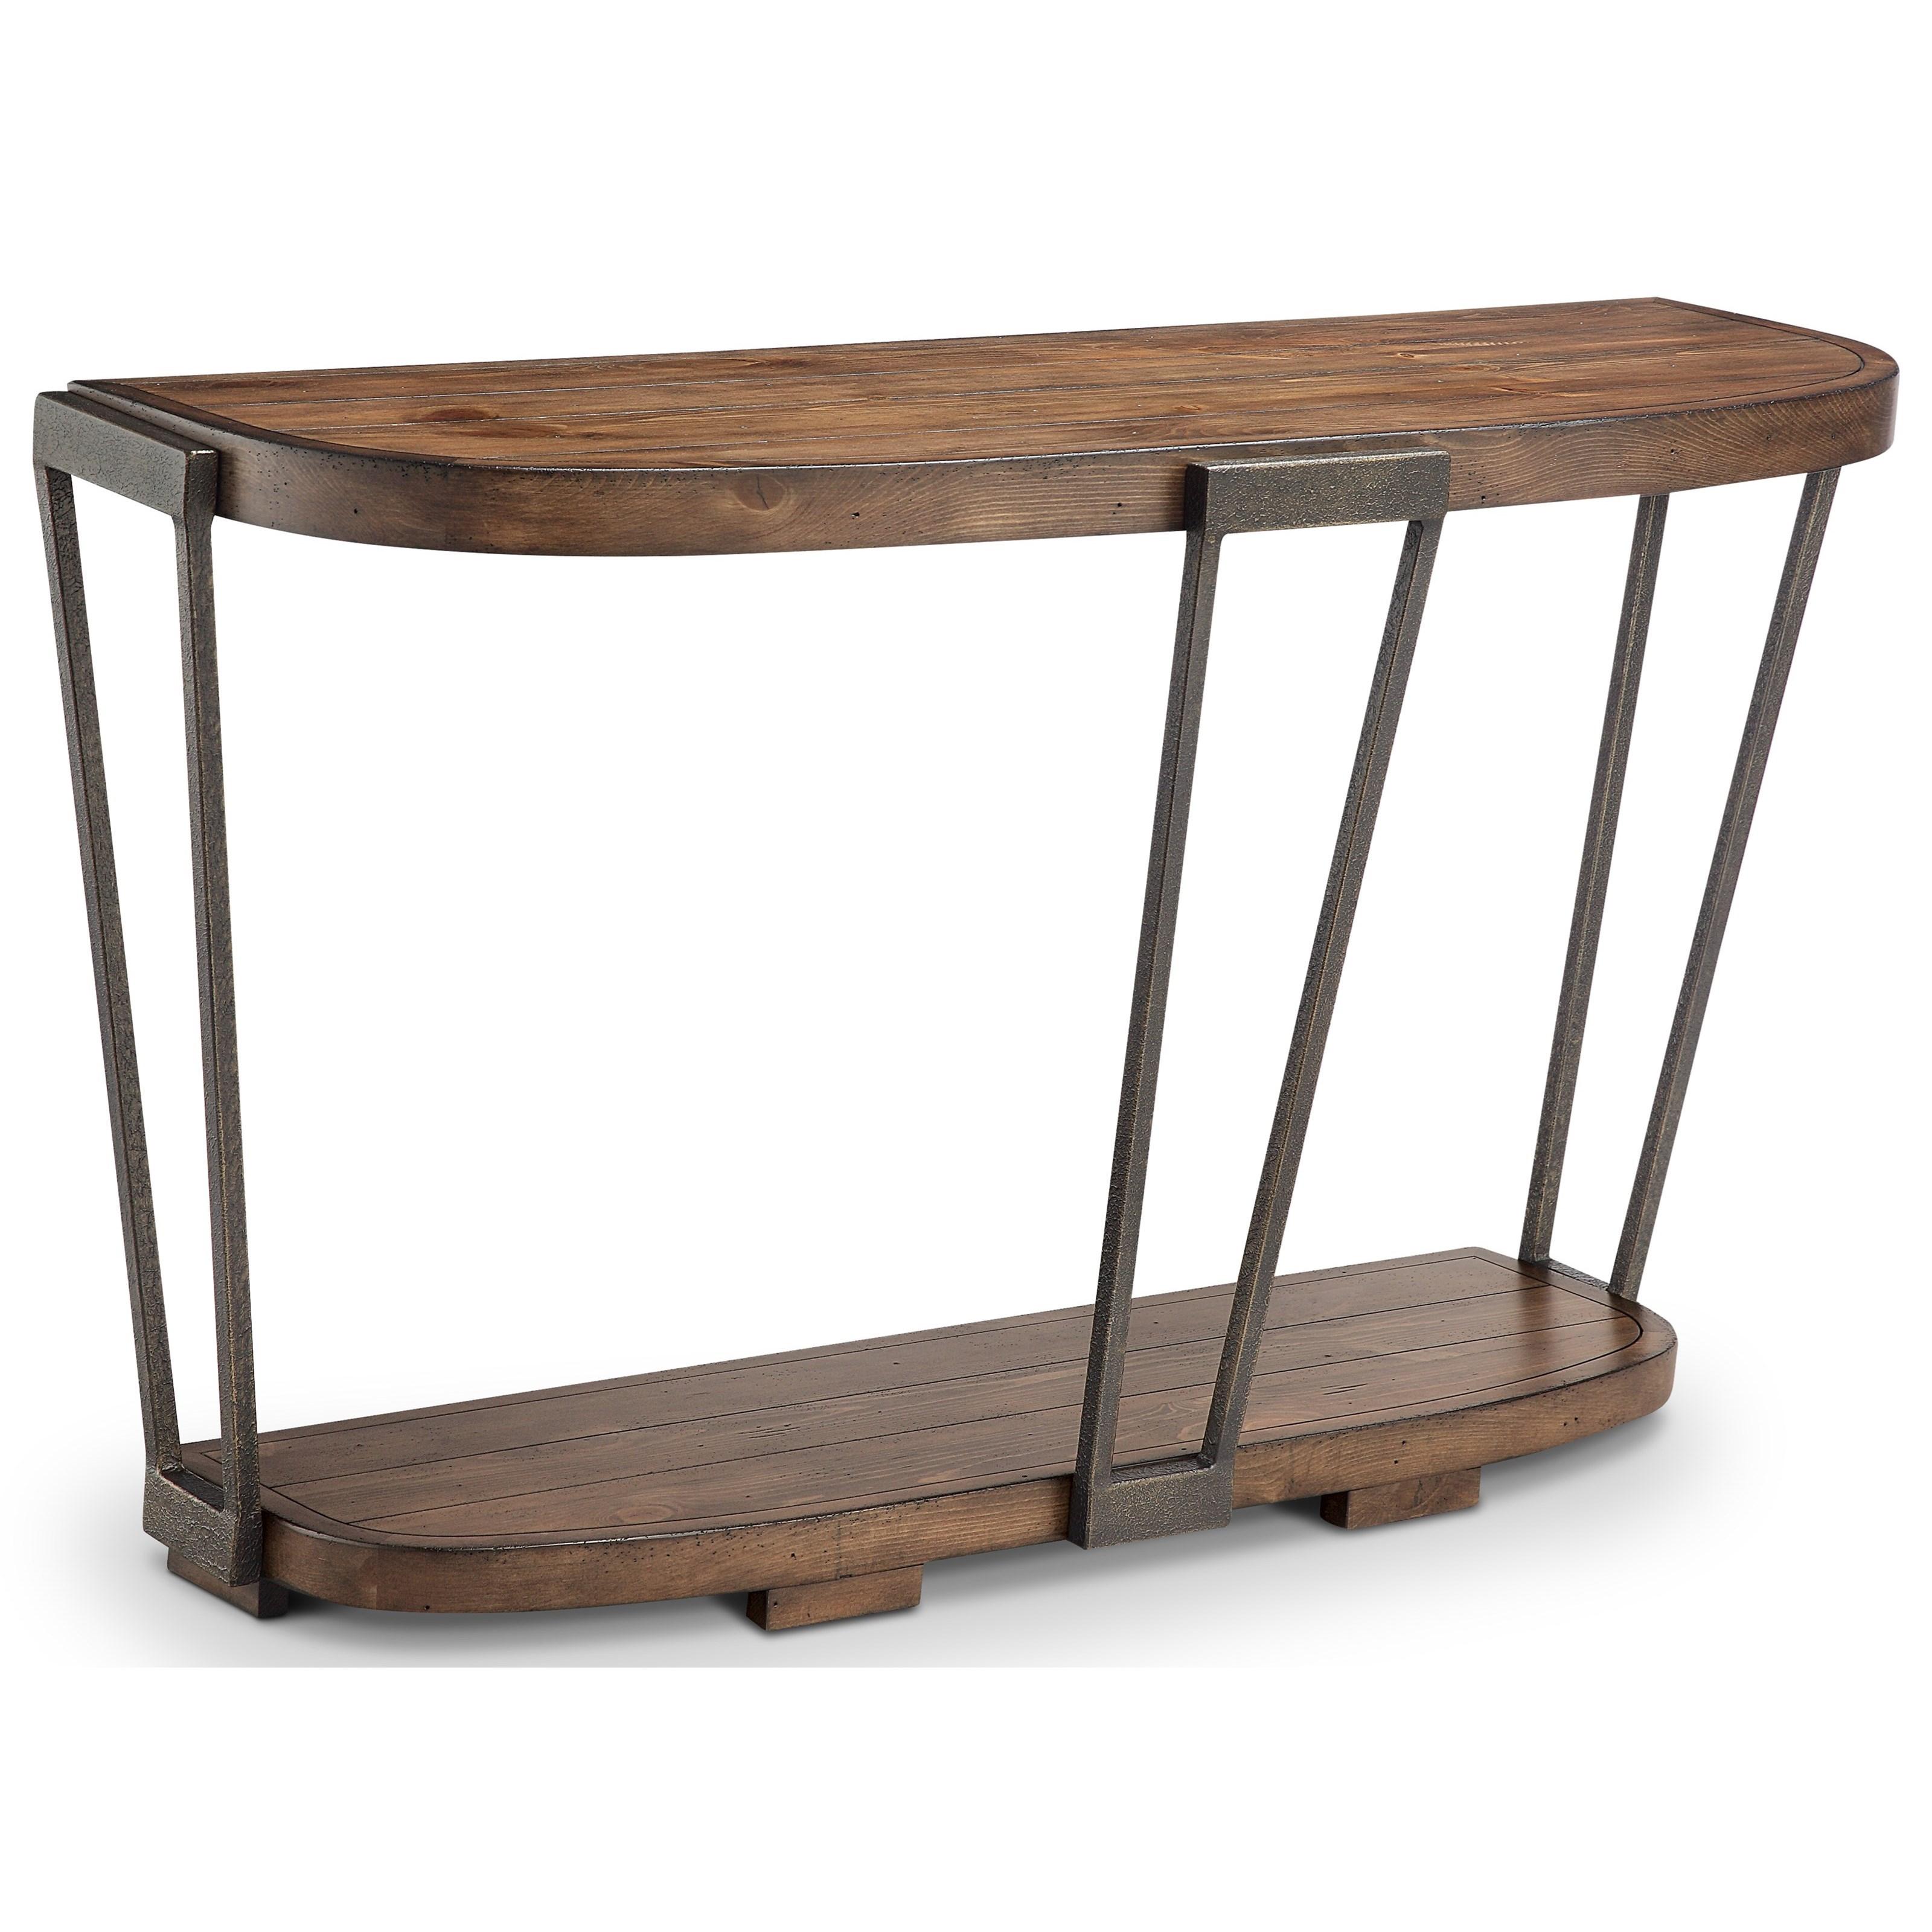 Magnussen Home YukonDemilune Sofa Table